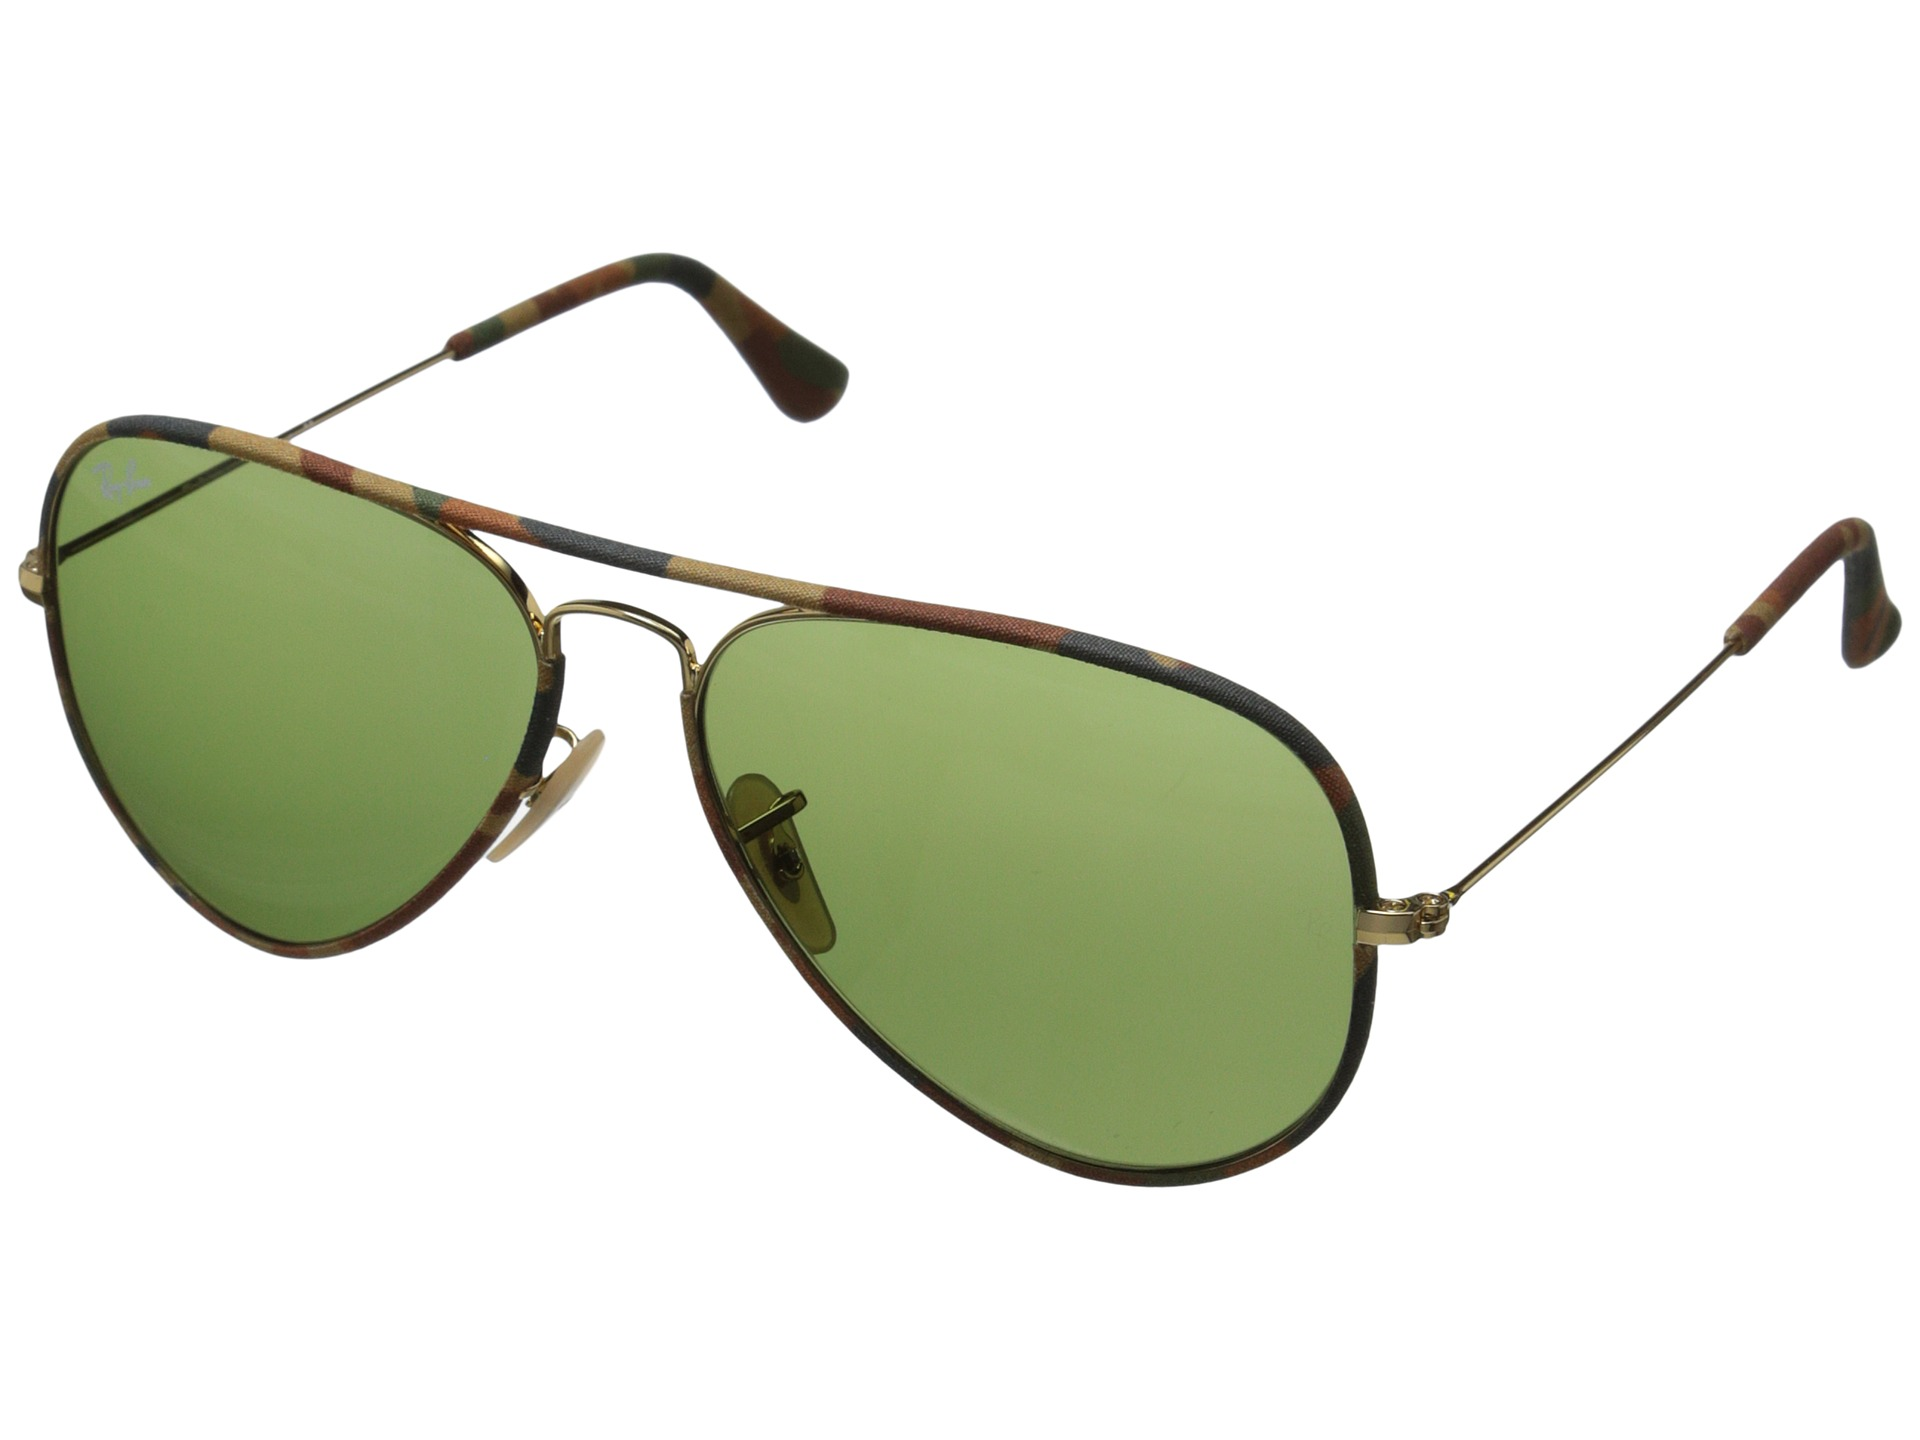 Oculos Oakley Feminino Betray « Heritage Malta 6d37a5b2ed